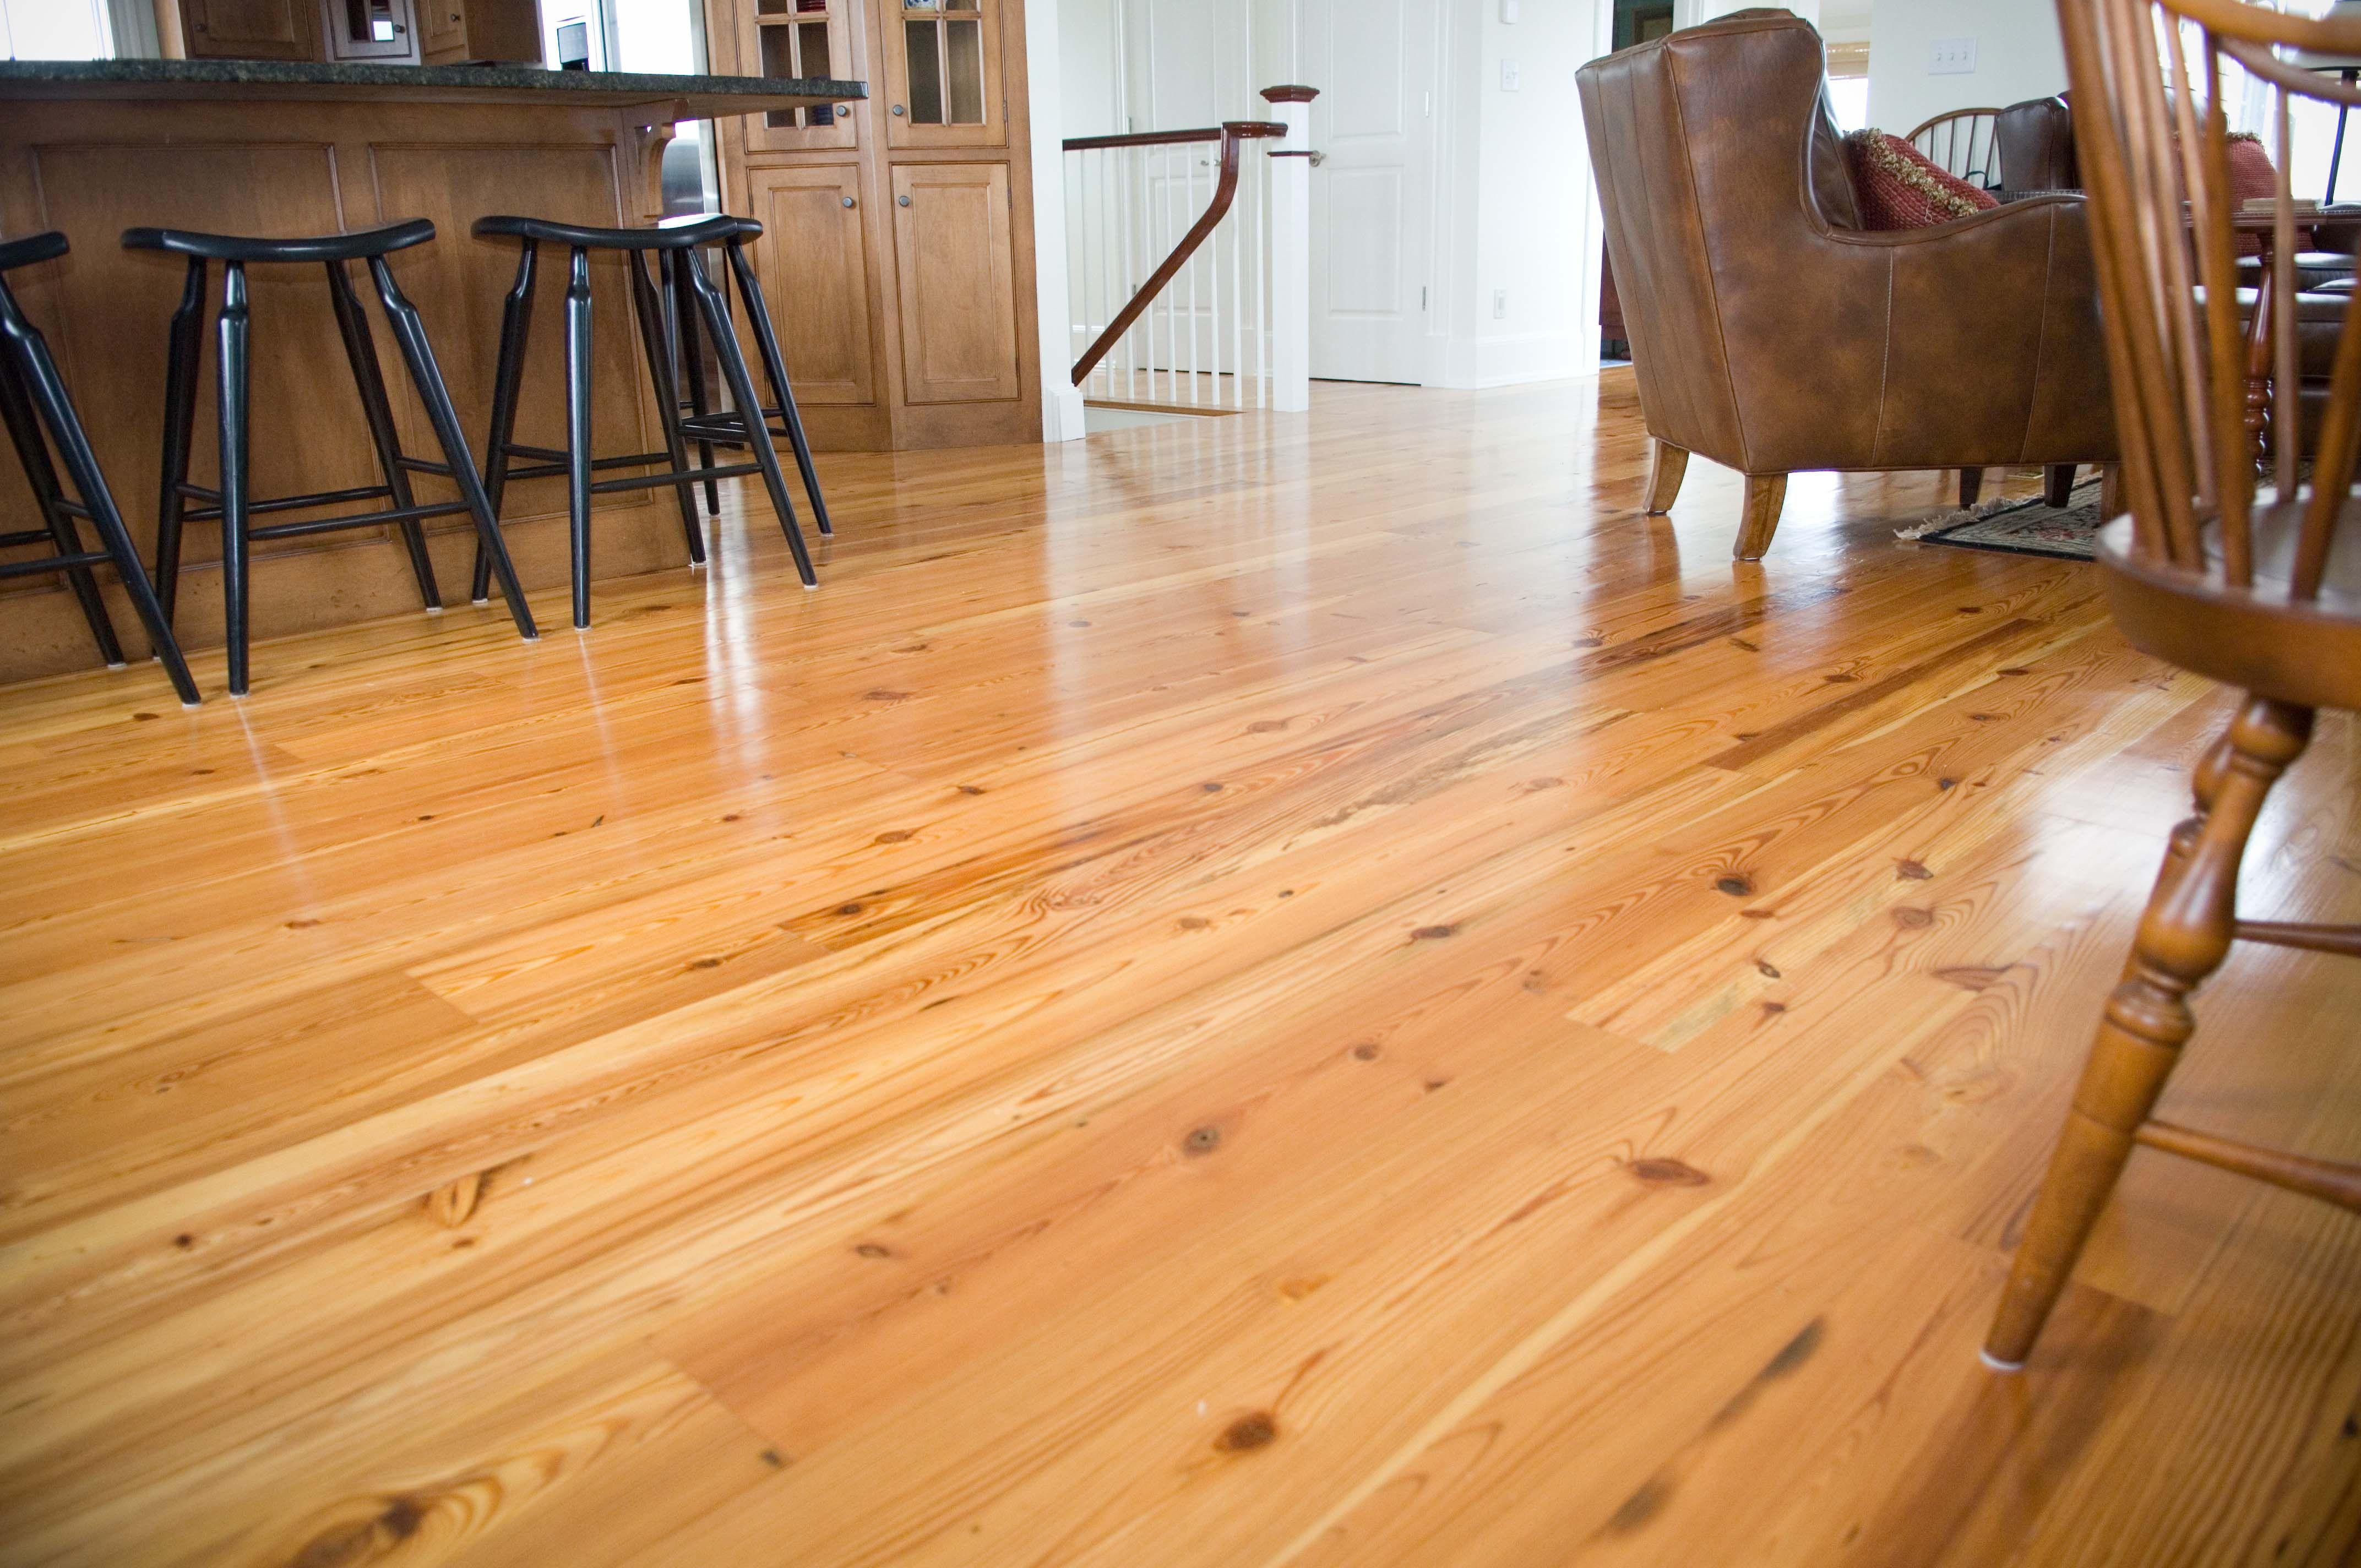 Pine Laminate Flooring natural values ii 256 summerville pine laminate flooring by shaw Longleaf Lumber Reclaimed 3 Rustic Heart Pine Flooring In A Home Hallway